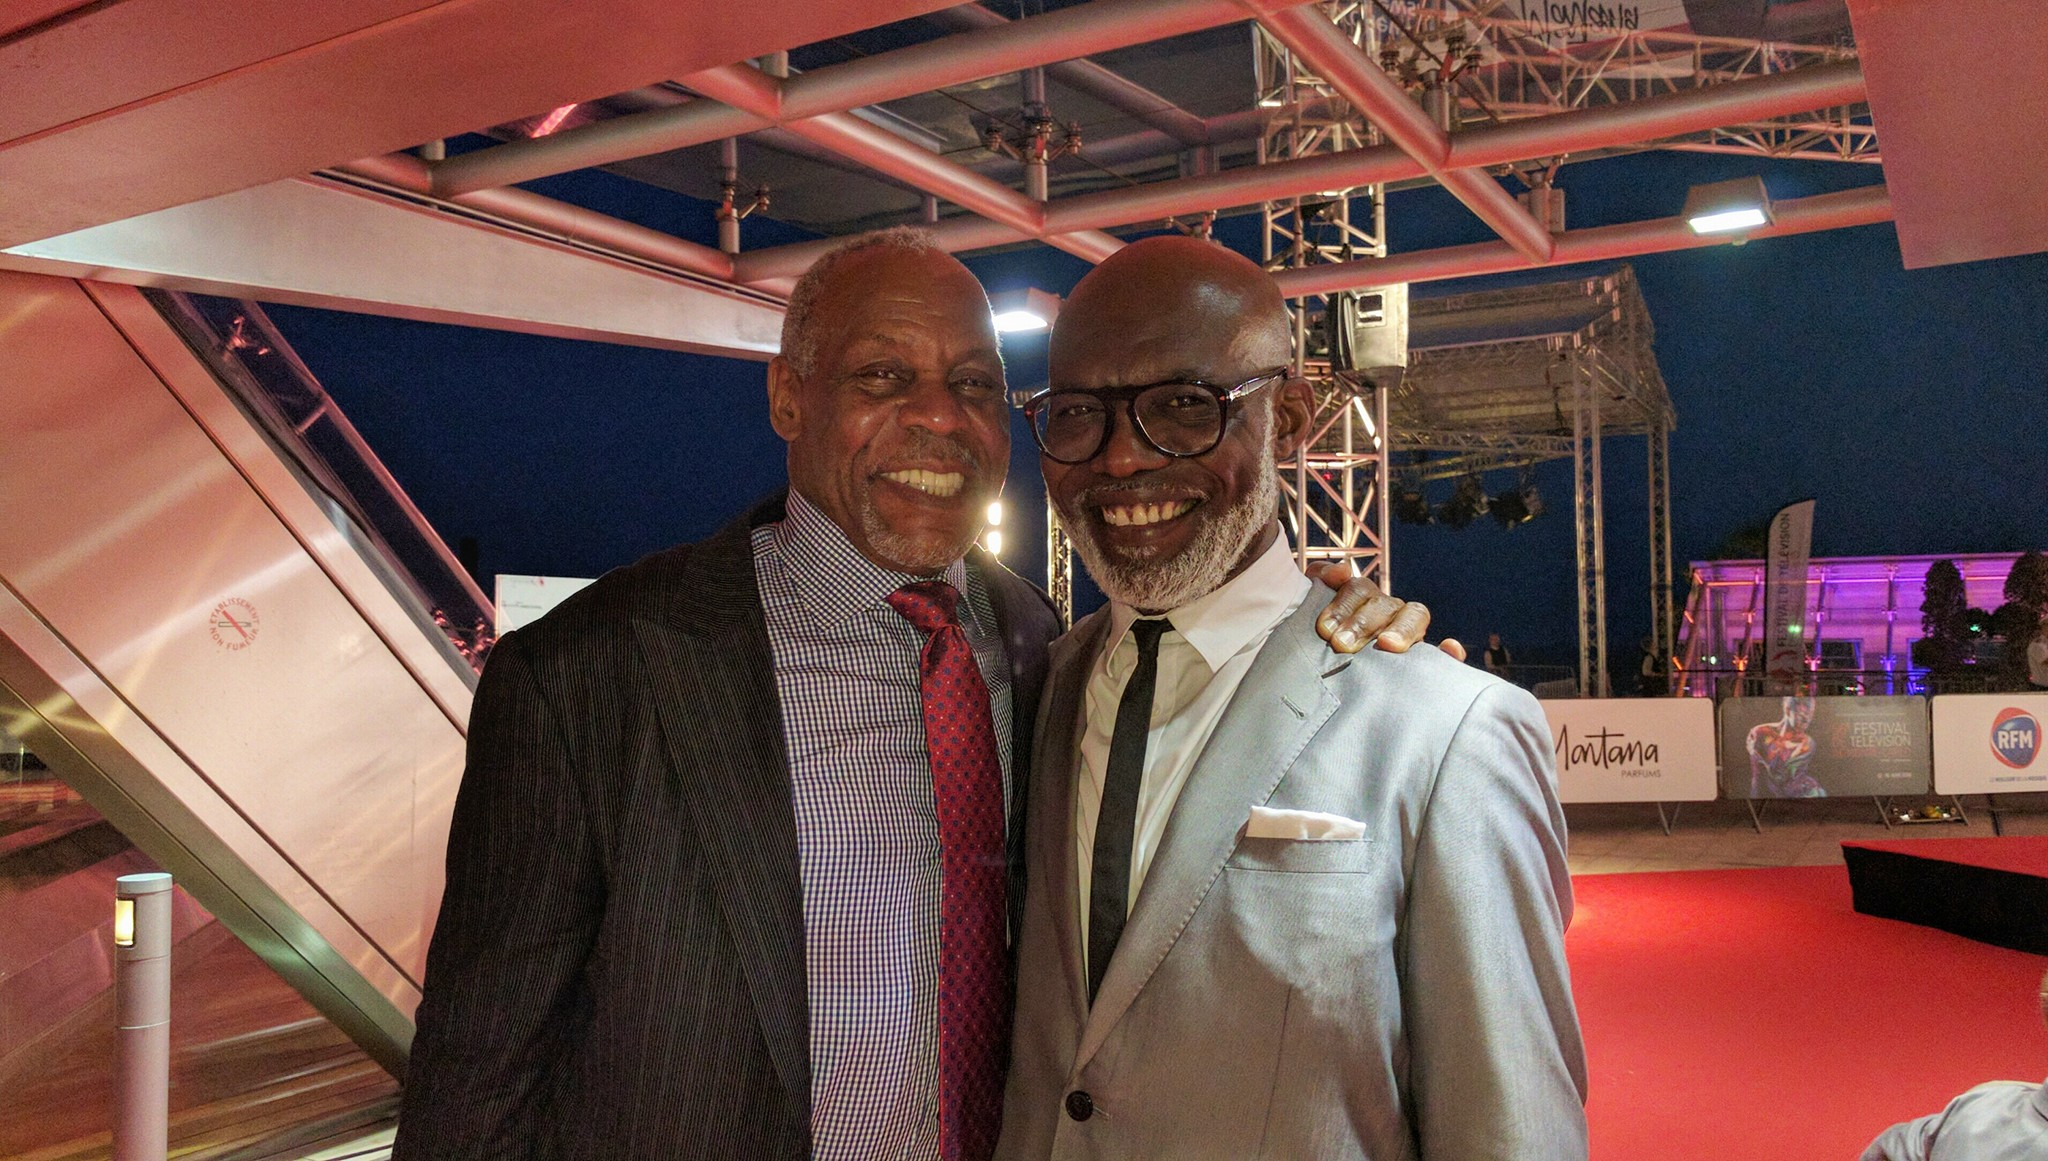 Danny Glover and Eriq Ebouaneyau Festival Montecarlo FTV16 ( photo lobographik)